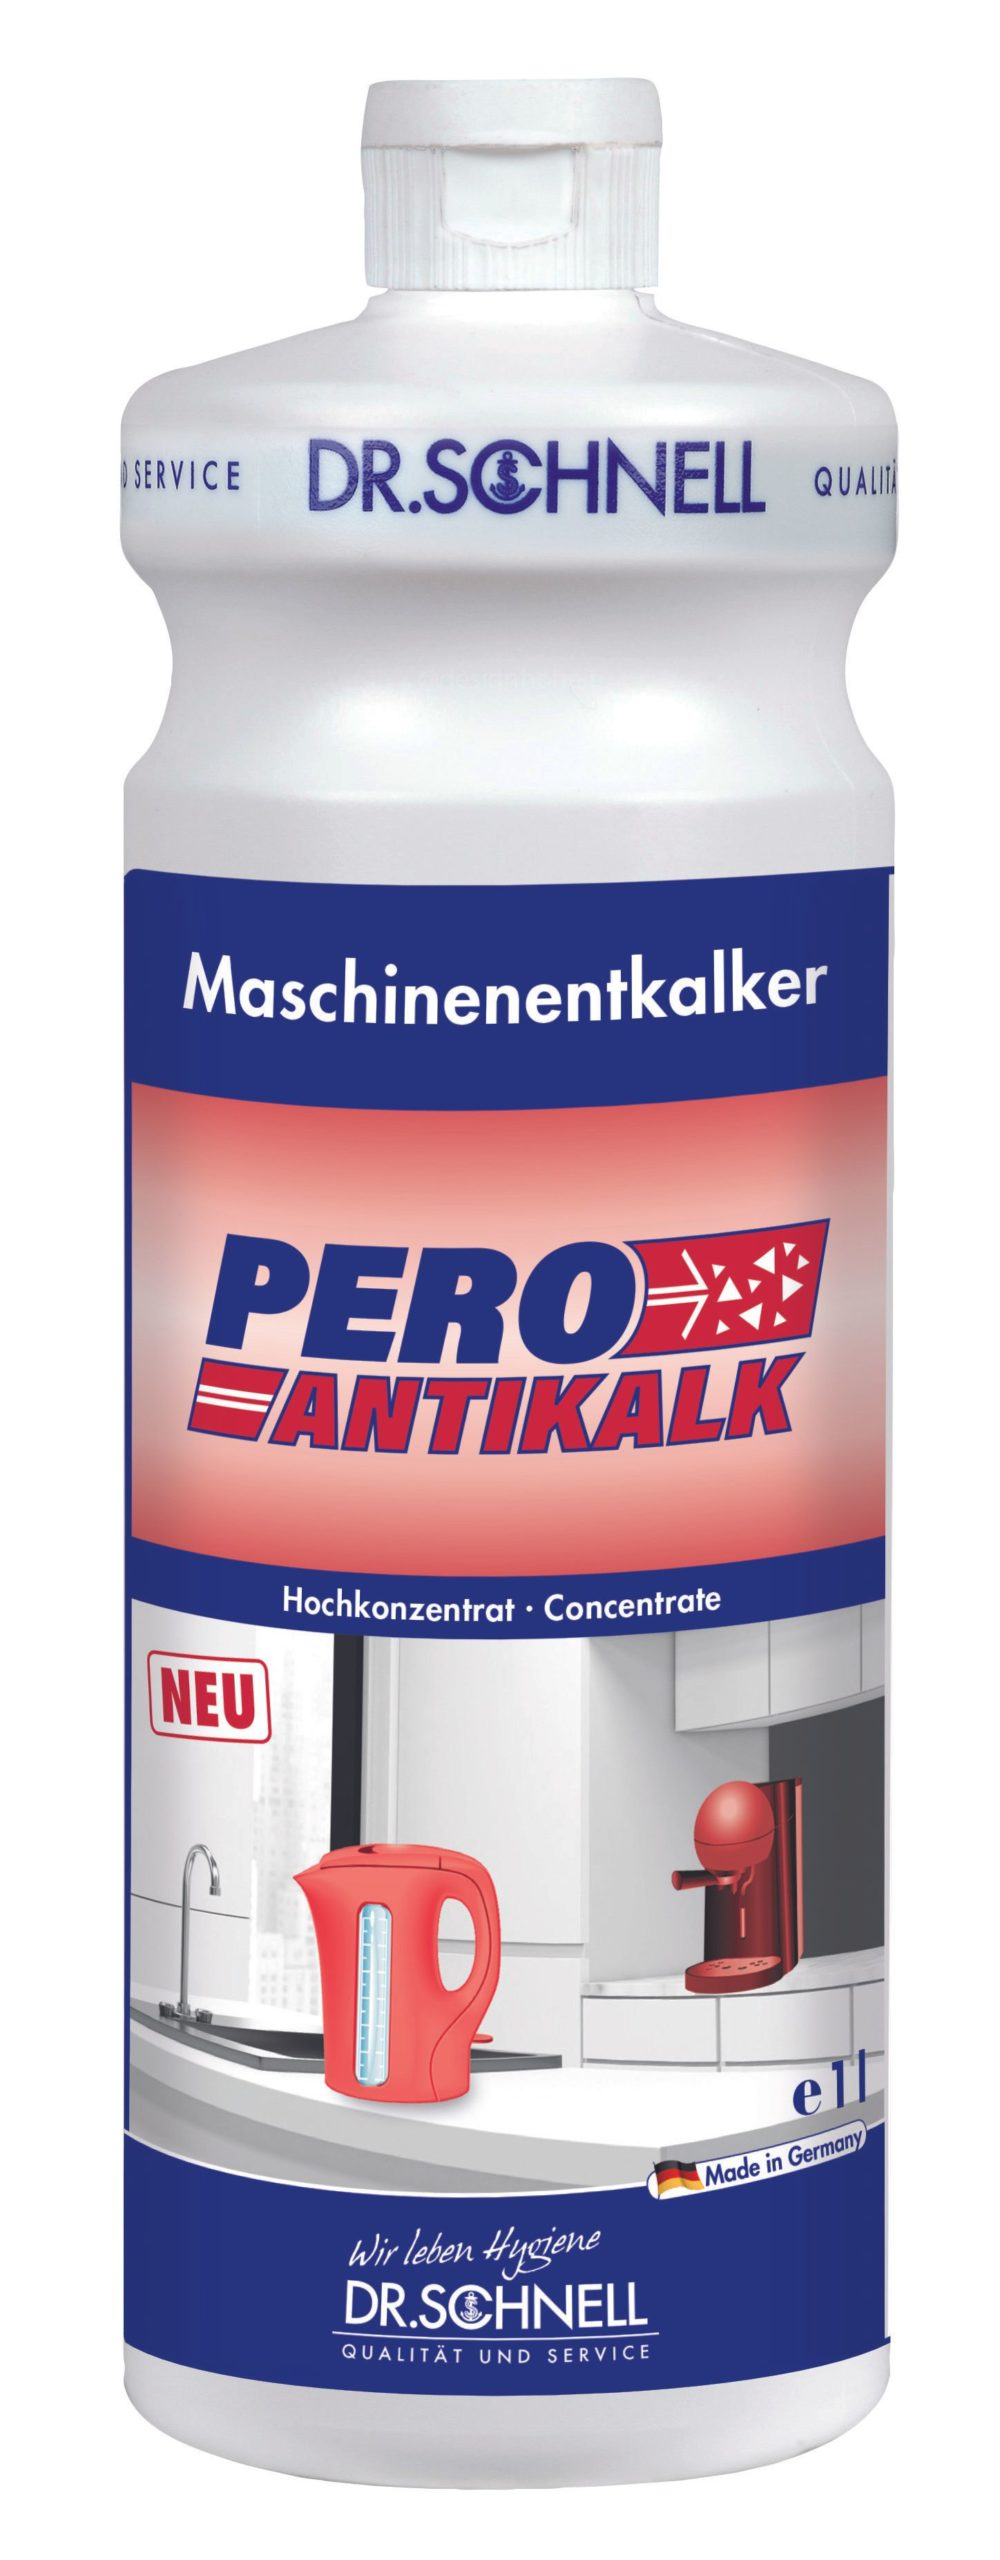 seidel_kueche_dr_schnell_pero_antikalk